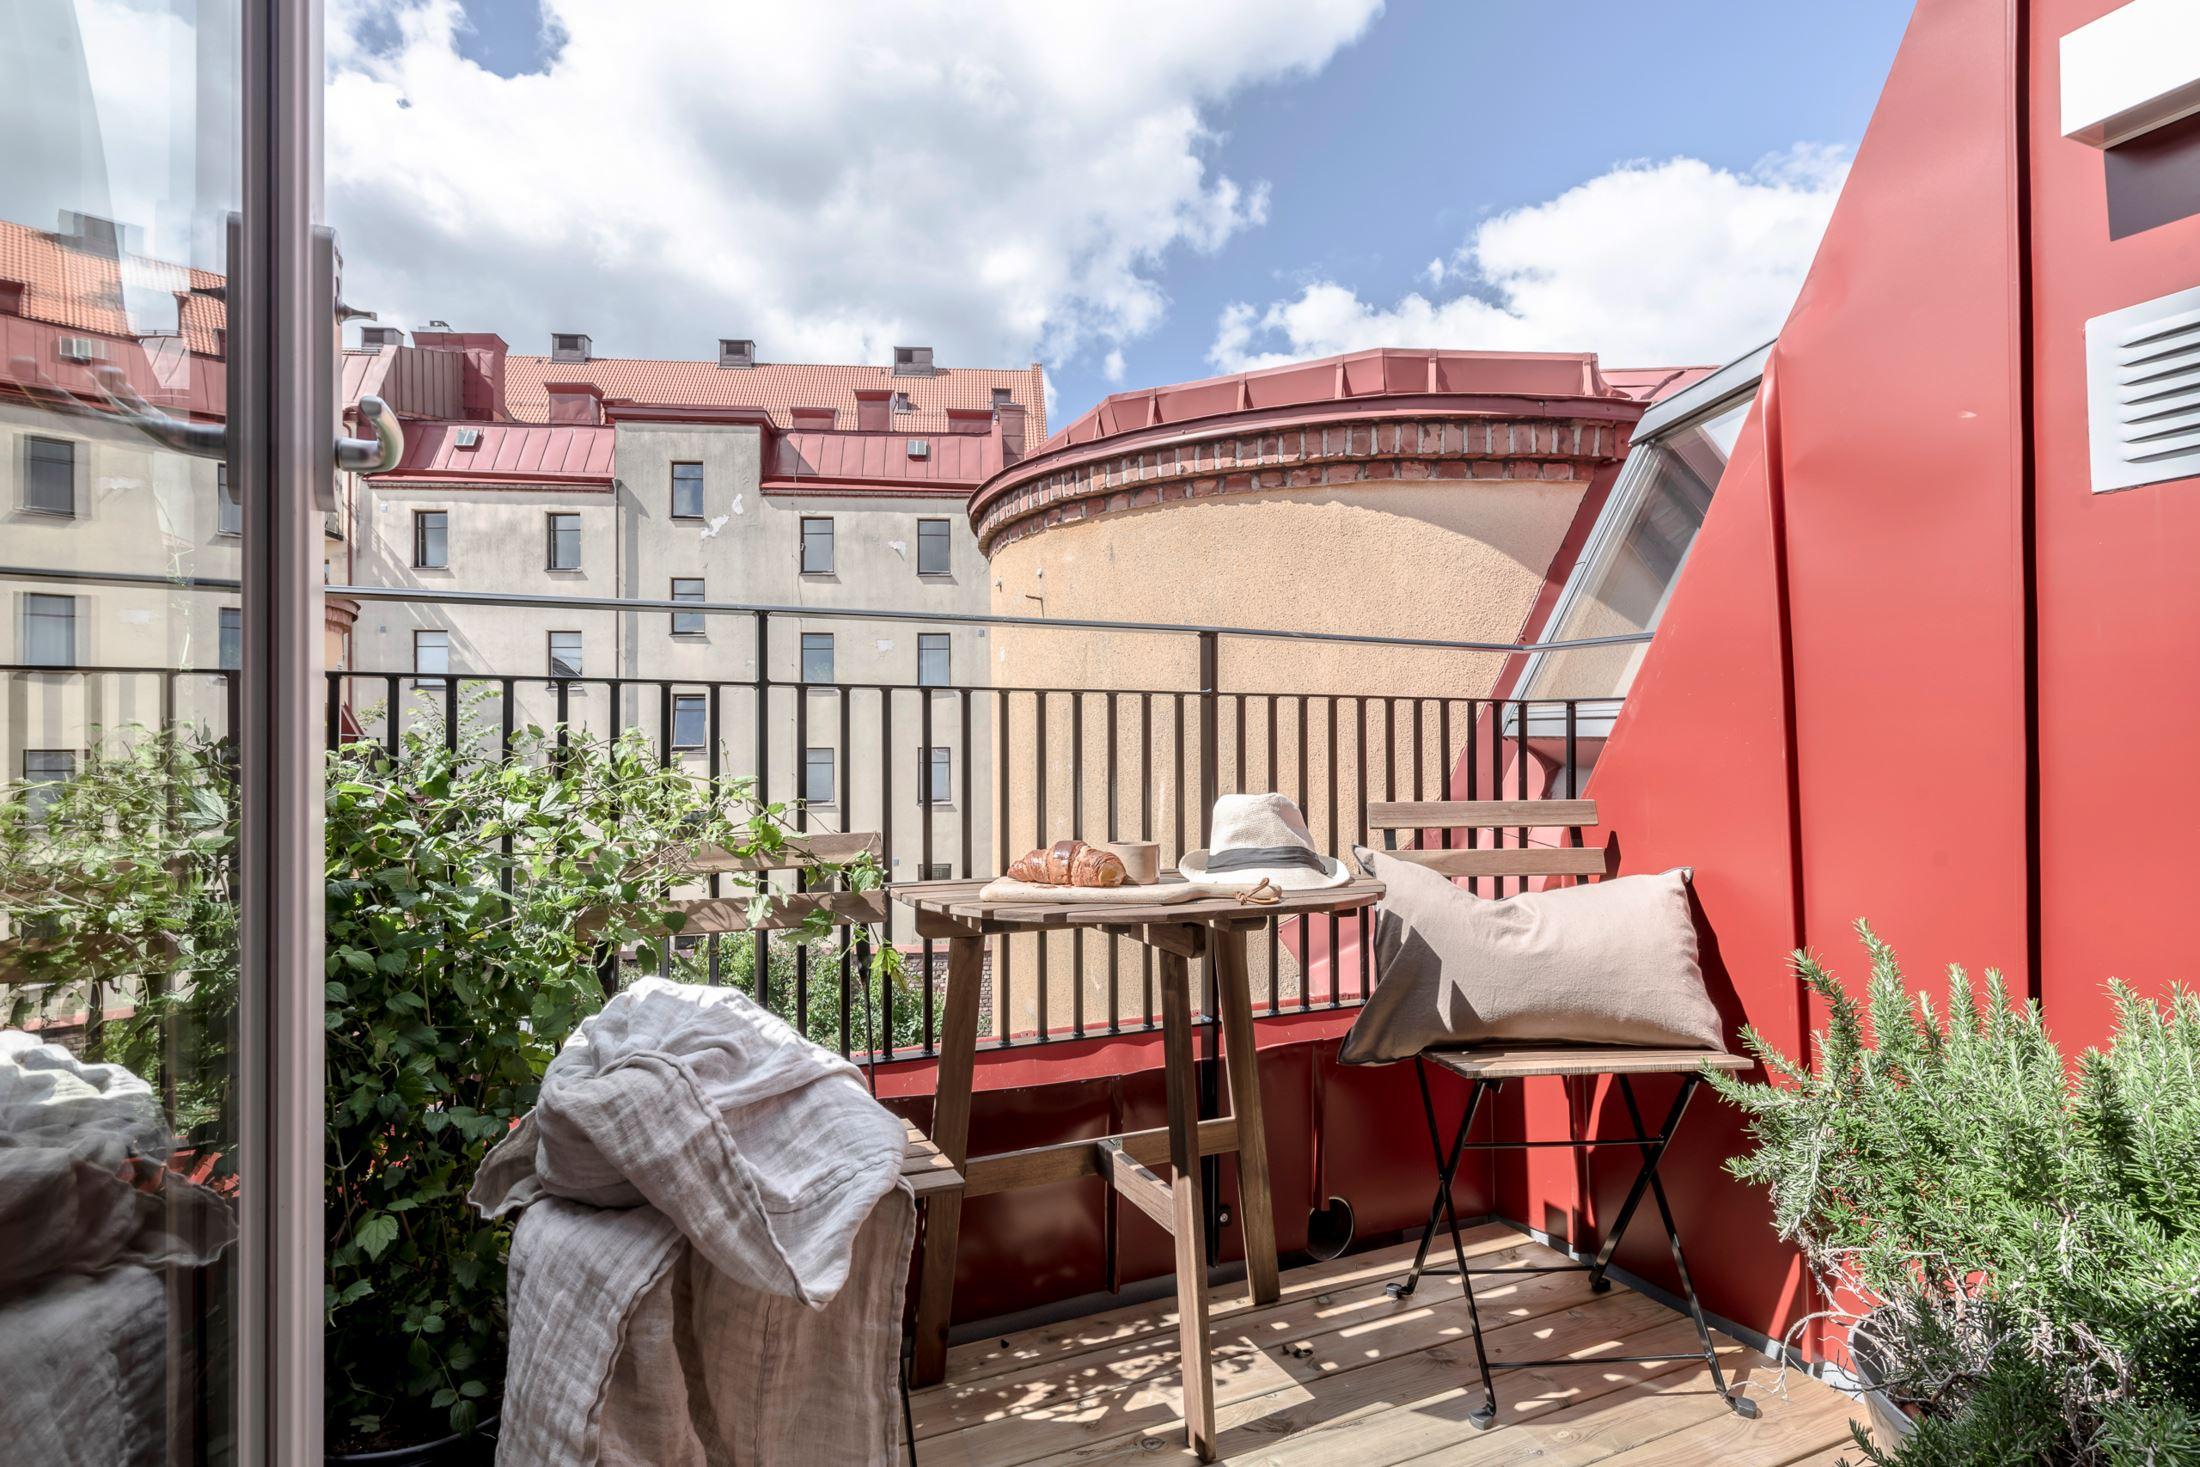 Plan deschis și decor nordic într o garsonieră la mansardă 35 m² 21